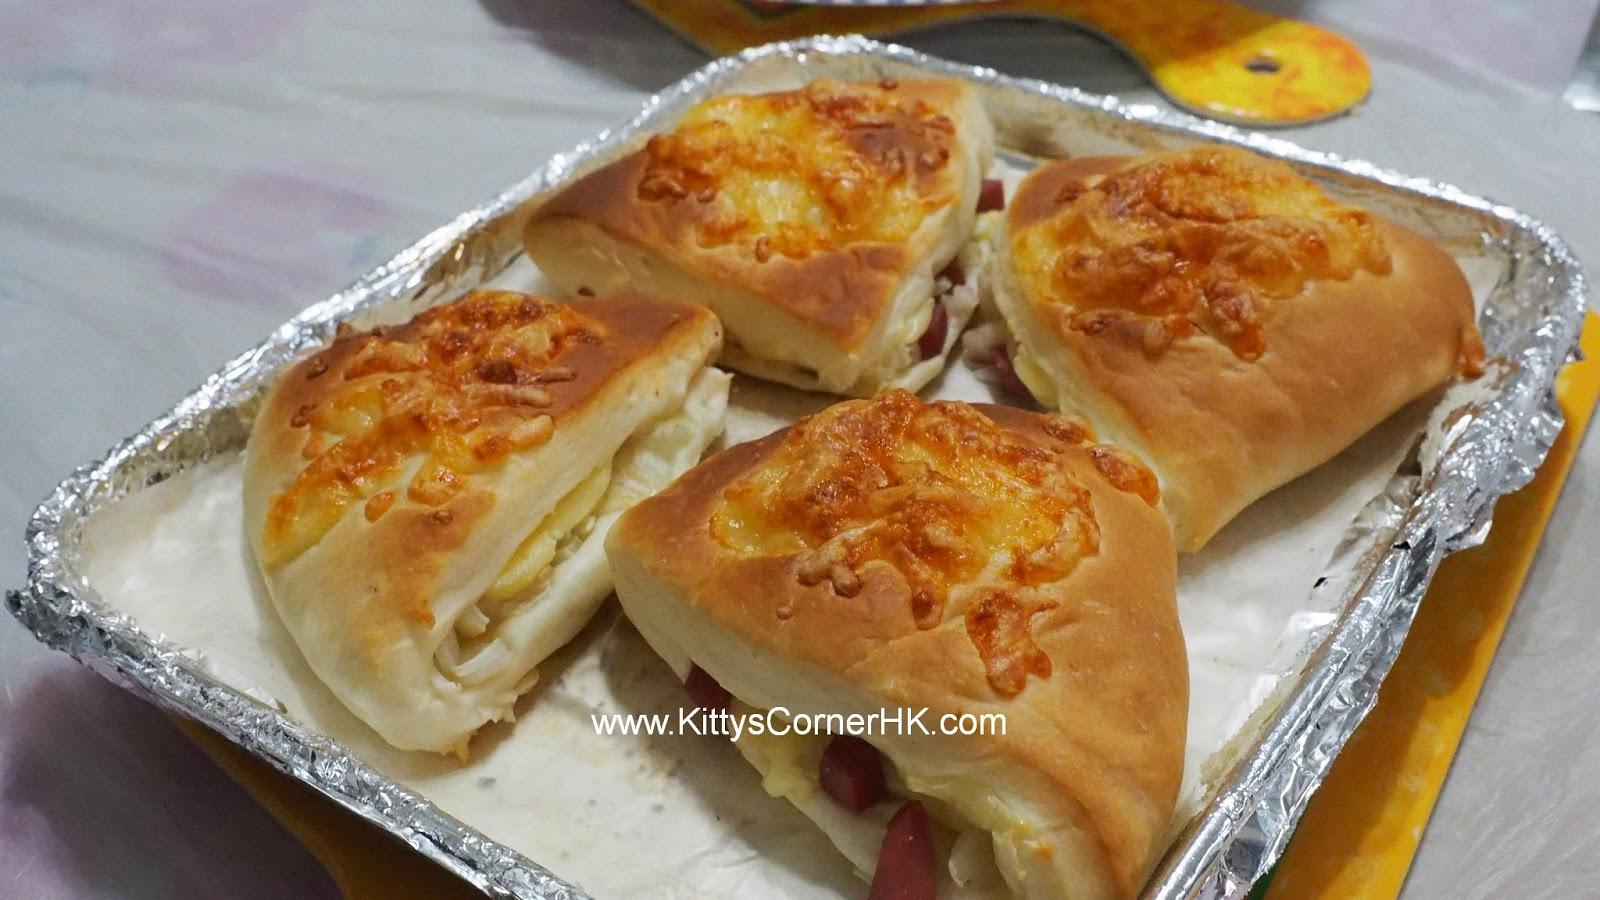 Sausage & Onion Bread 肉腸洋蔥芝士脆脆包 自家烘焙 食譜 home baking recipes